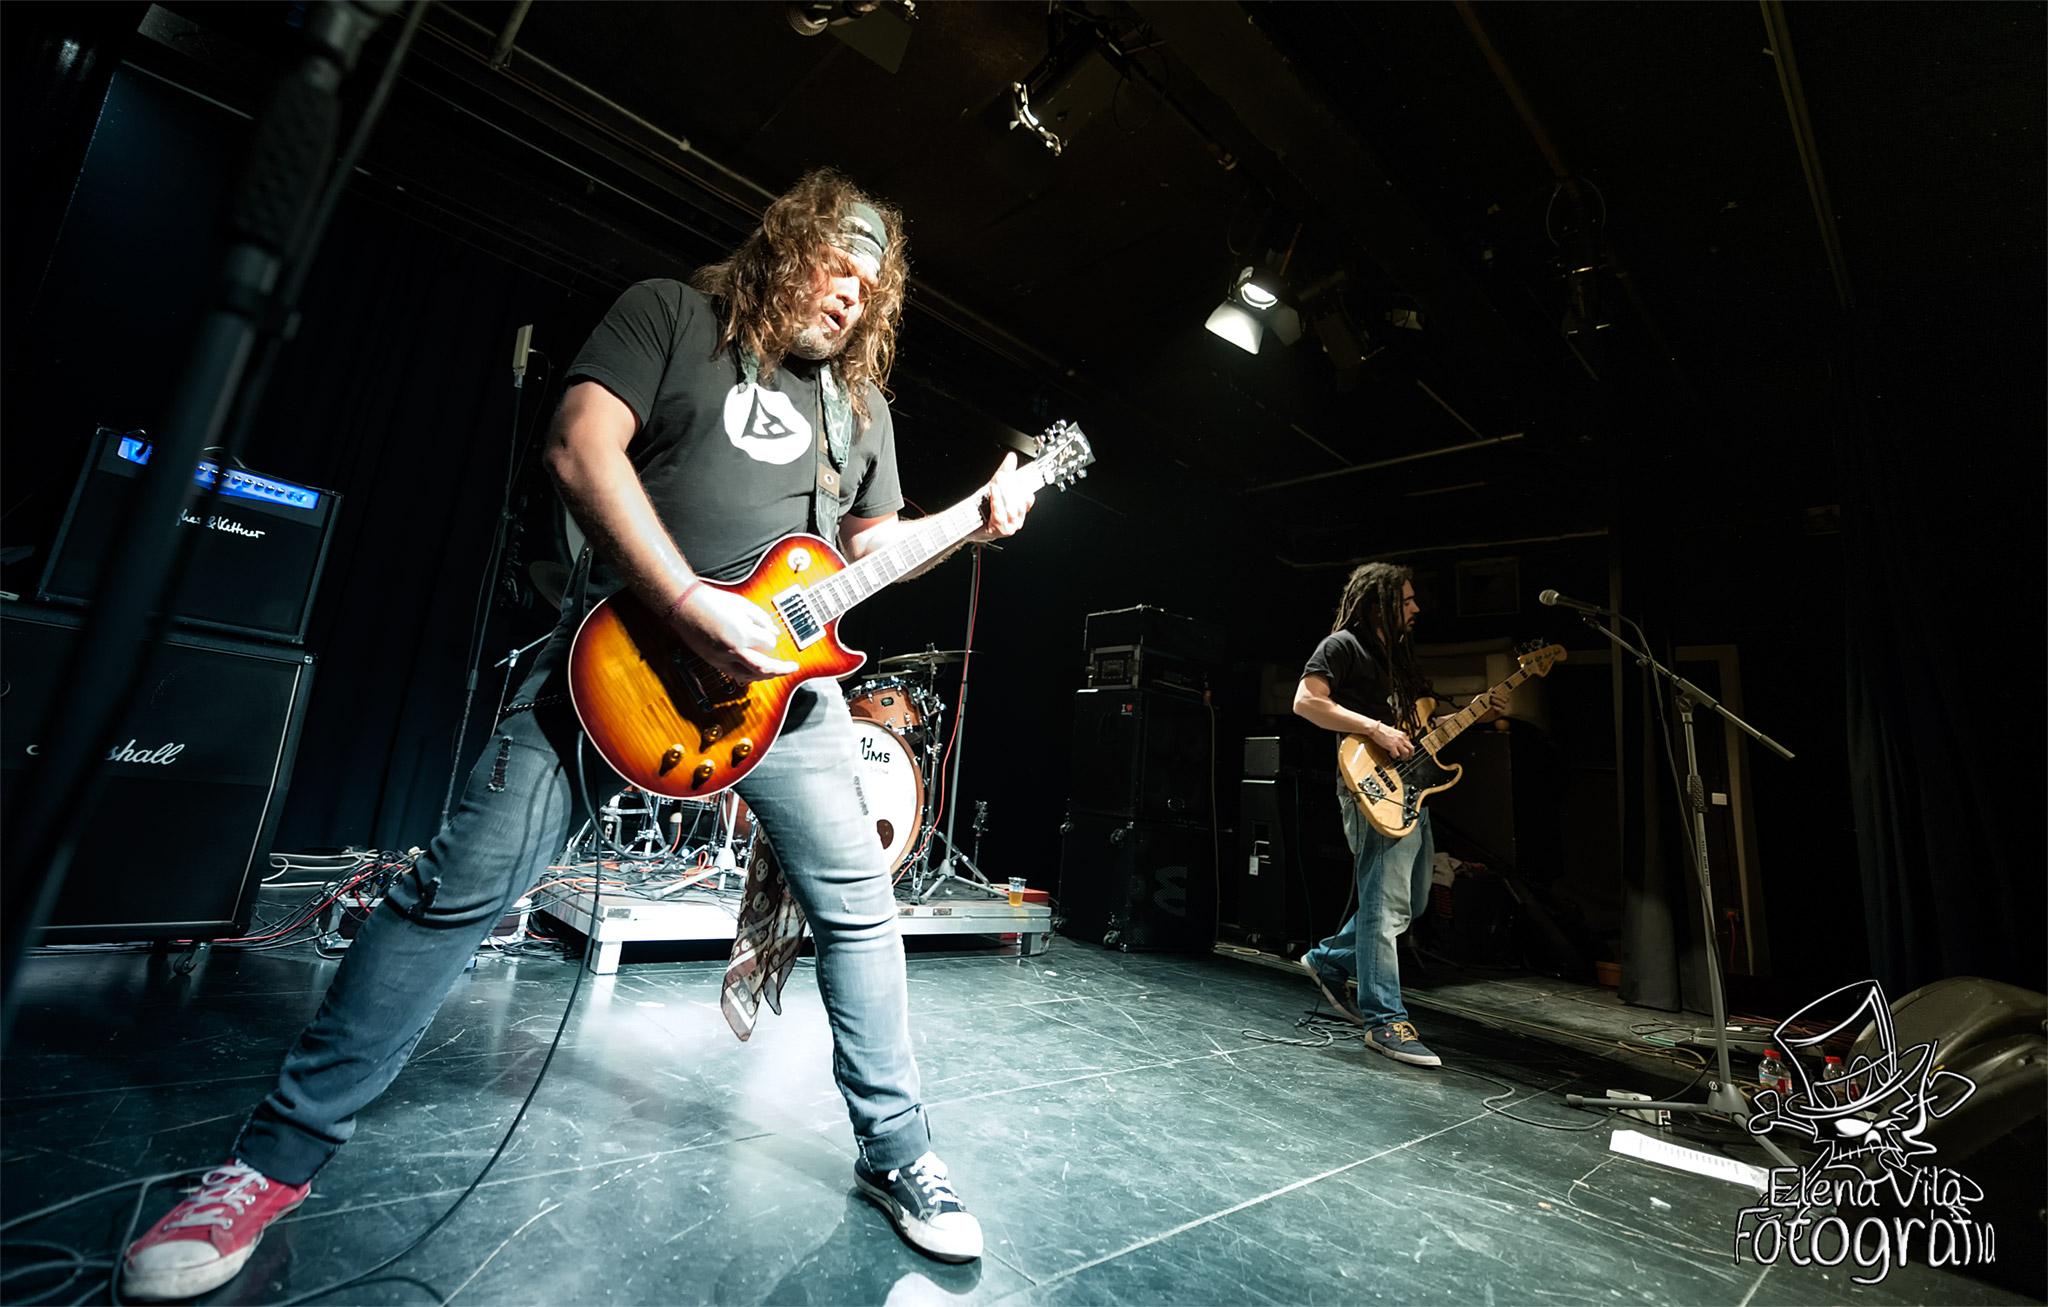 Elisma rock'n'civic 15